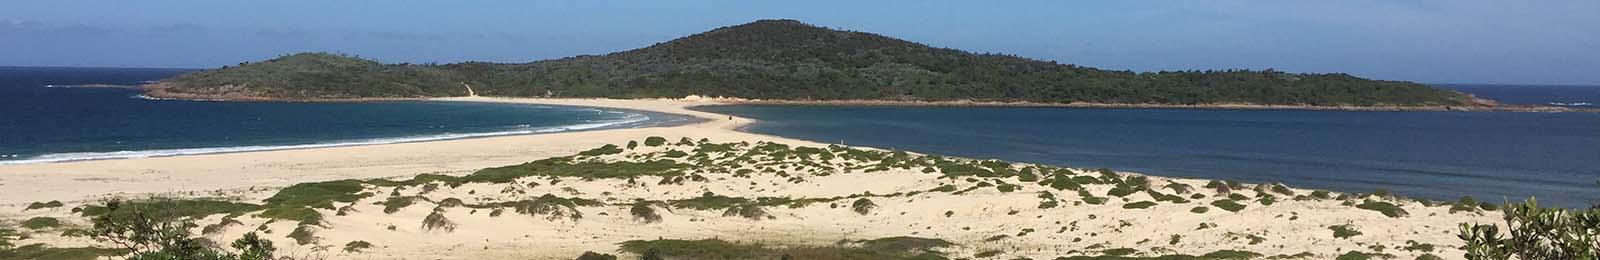 Image of Port Stephens environment